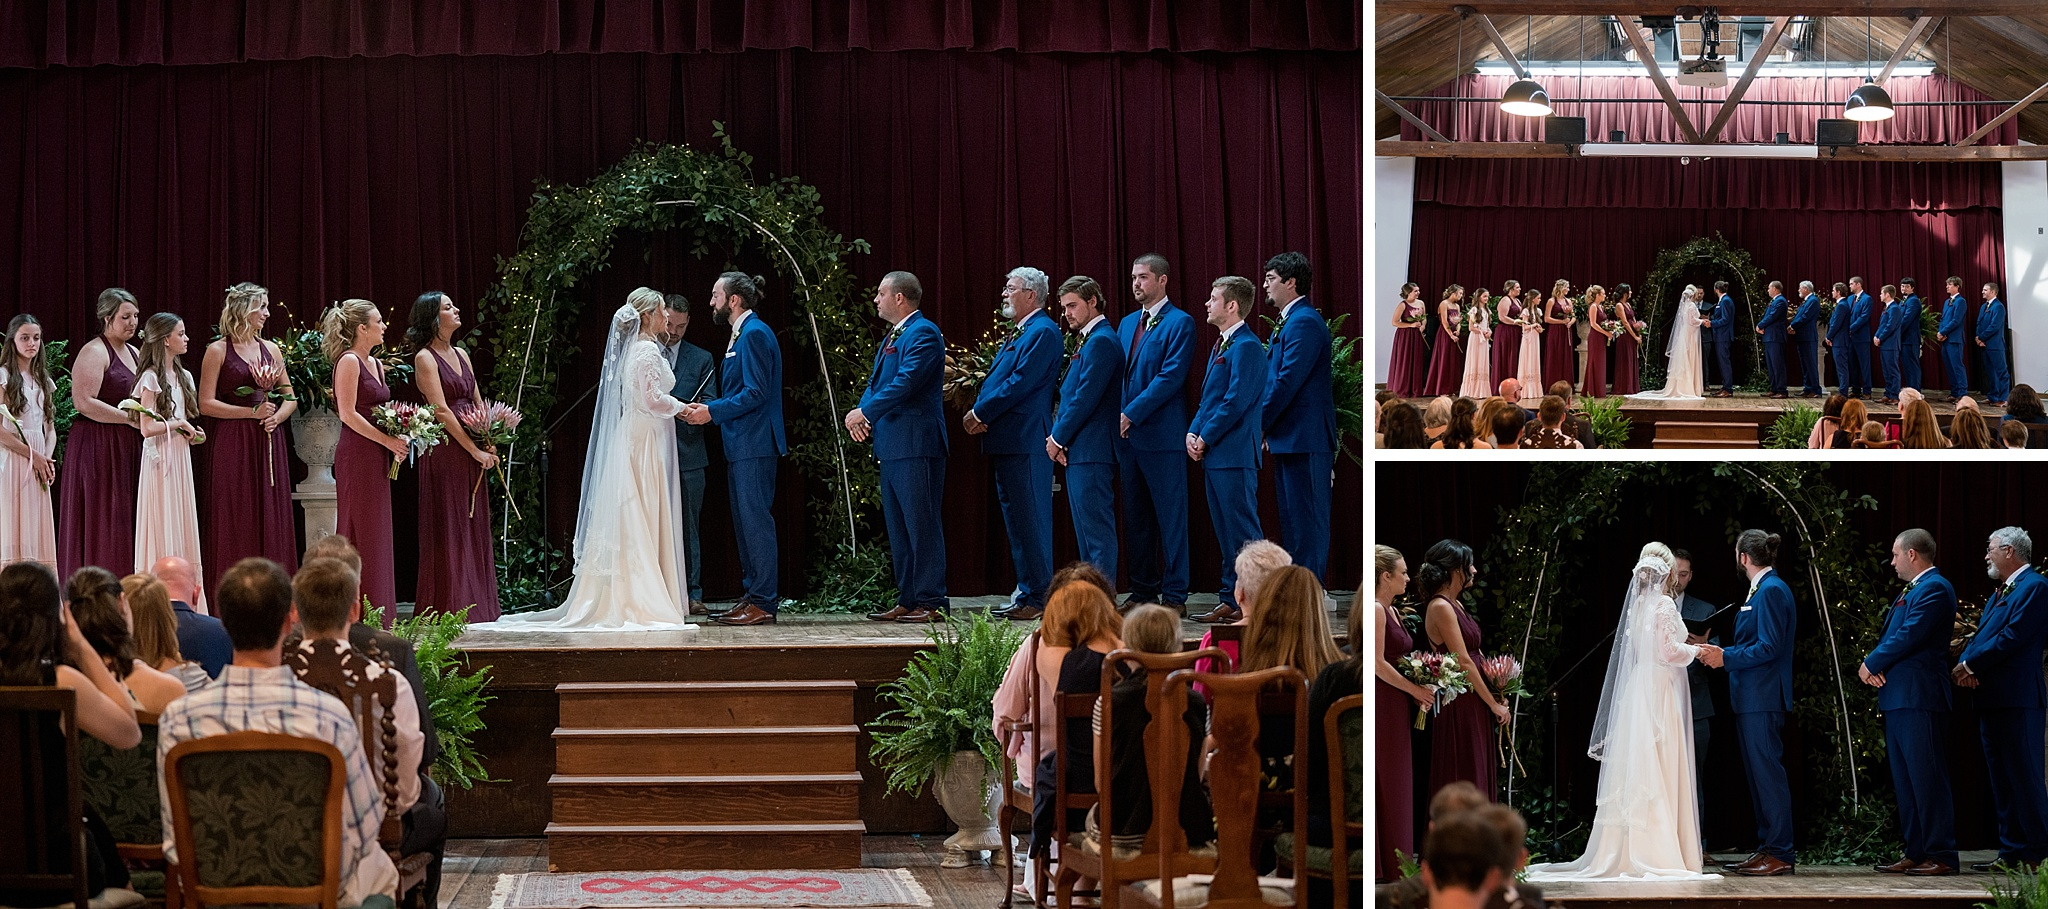 Washington-NC-Wedding-Photography-182.jpg